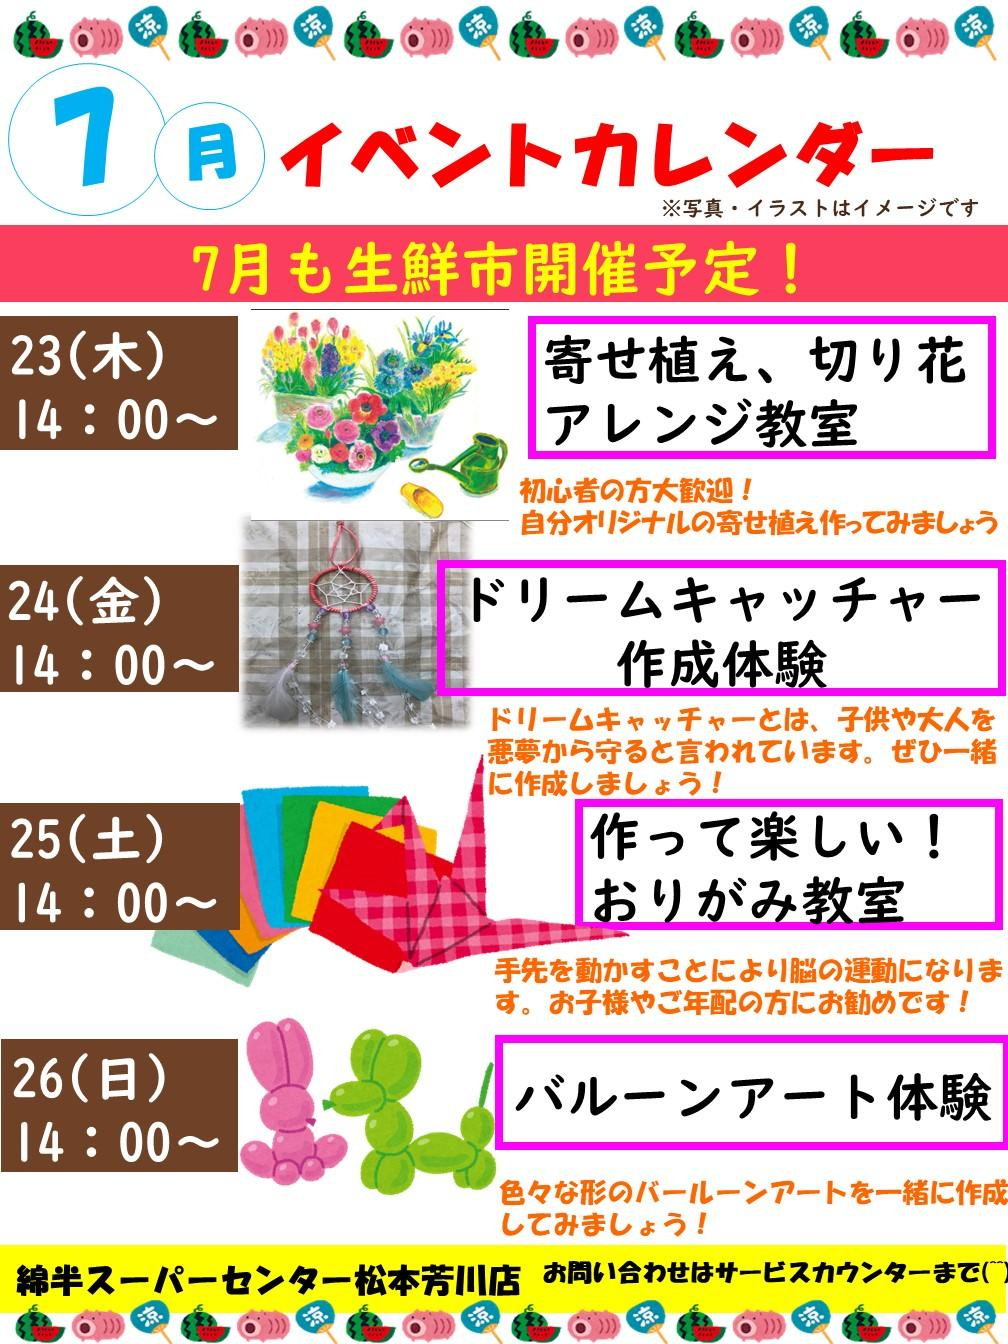 HAイベントカレンダーフォーマット2.jpg